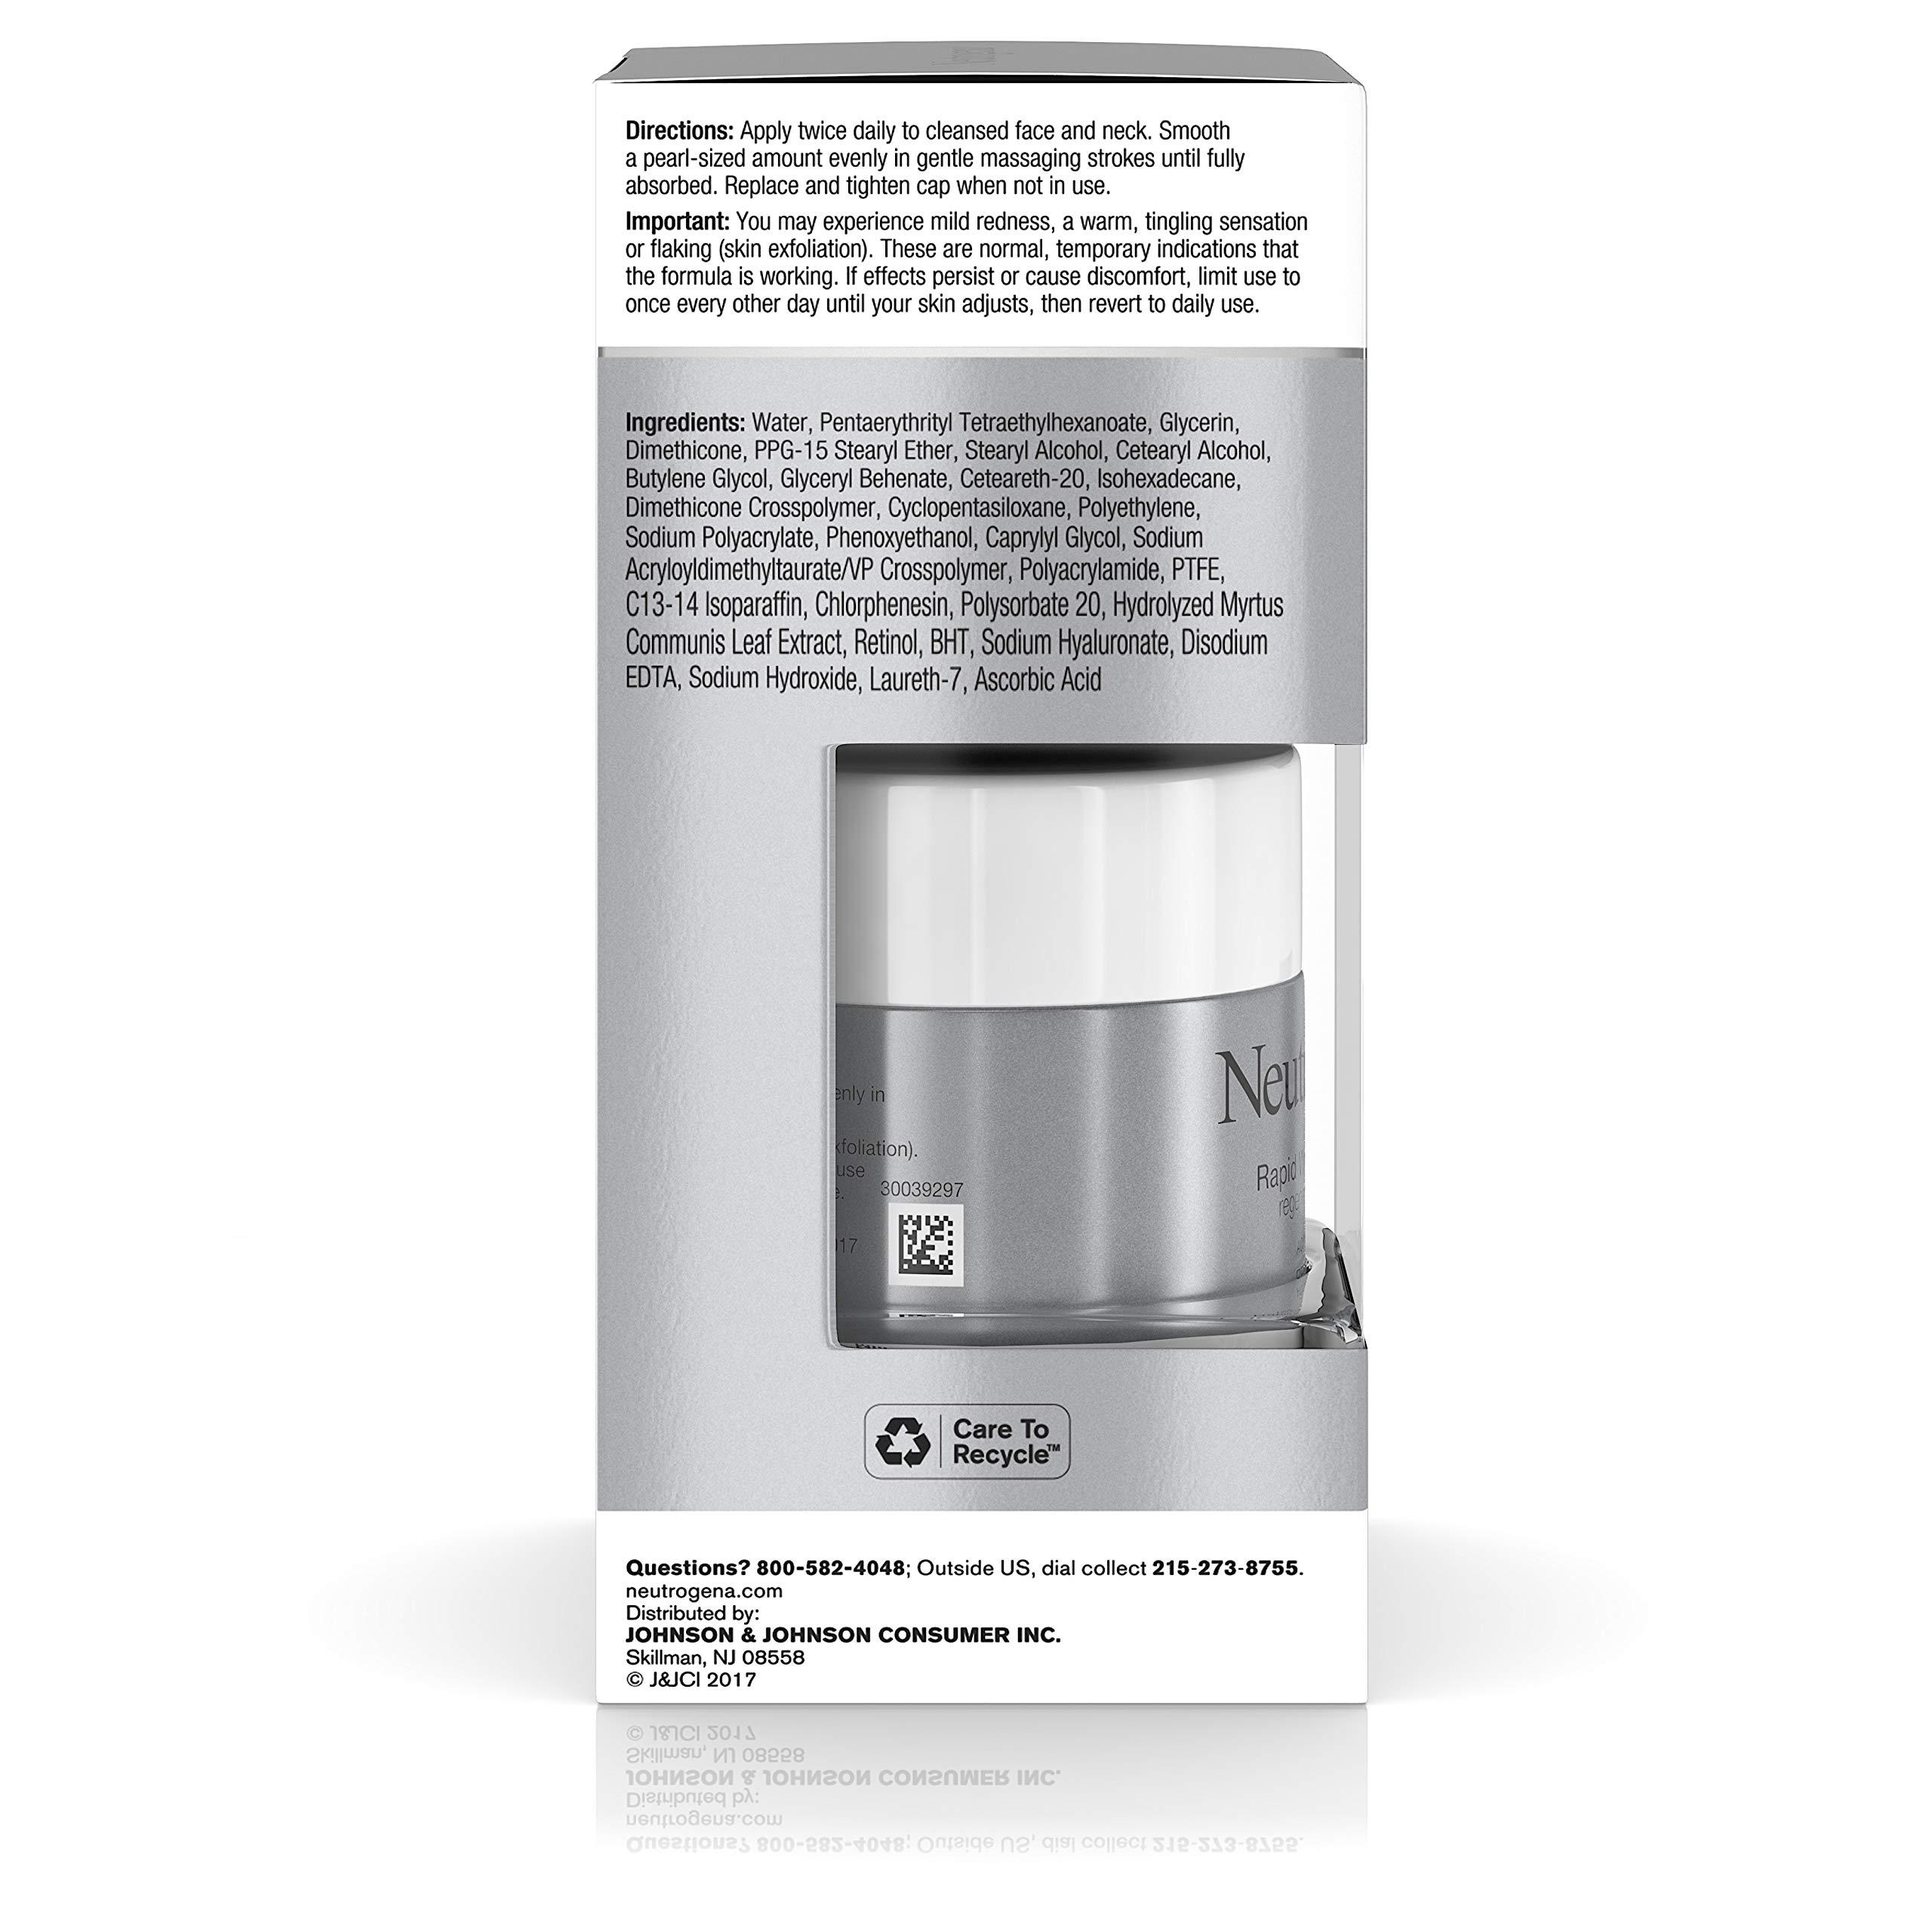 Neutrogena Rapid Wrinkle Repair Hyaluronic Acid Retinol Cream, Anti Wrinkle Cream, Face Moisturizer, Neck Cream & Dark Spot Remover for Face - Day & Night Cream with Hyaluronic Acid & Retinol, 1.7 oz by Neutrogena (Image #4)